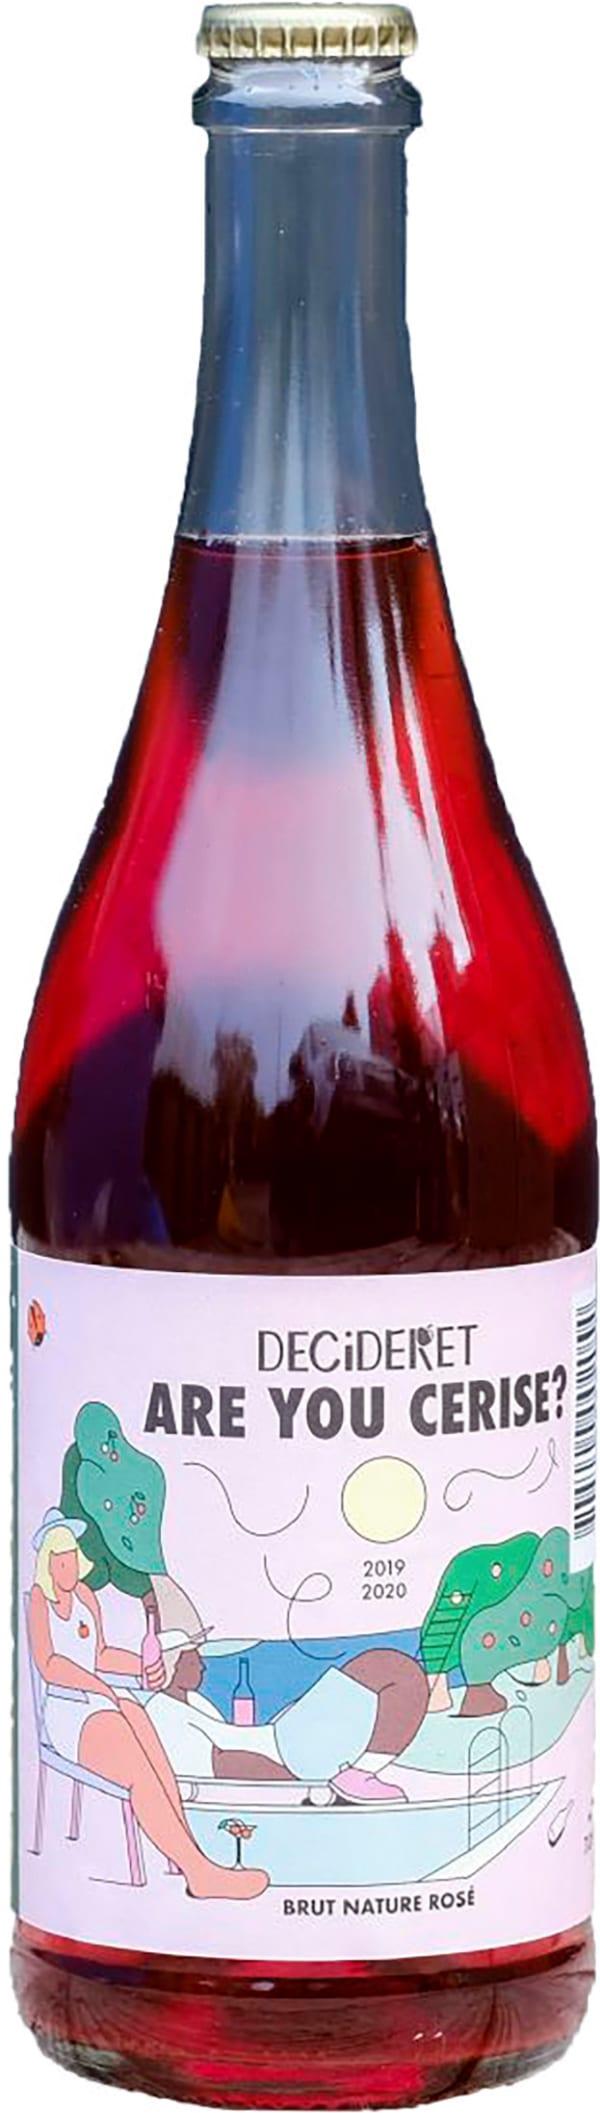 Decideret Are You Cerise? Brut Nature Rosé Cider